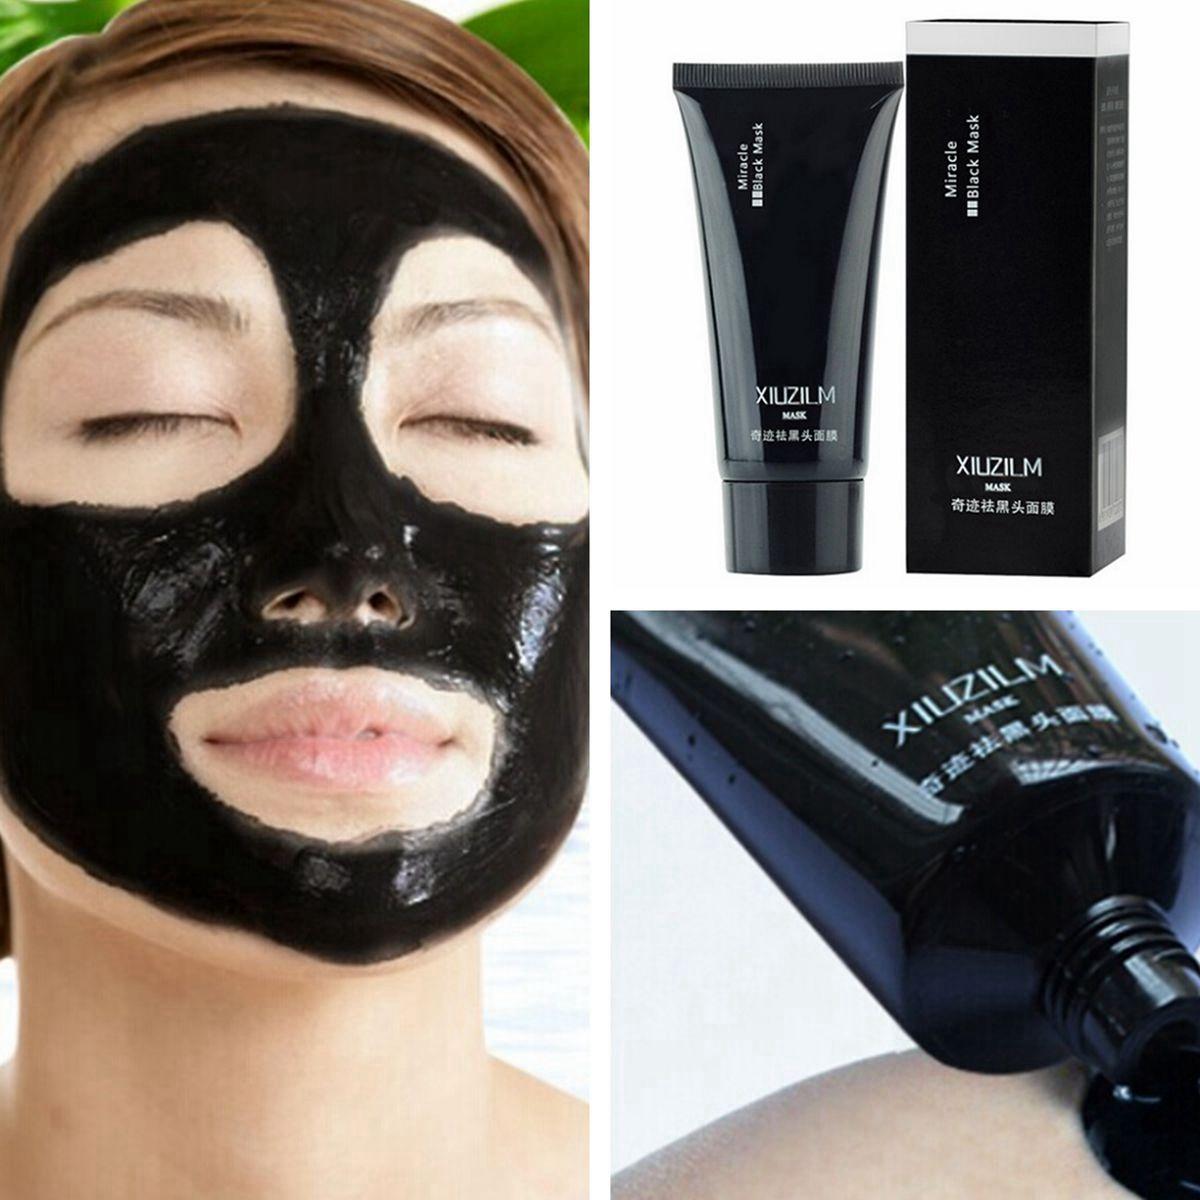 masque peeling nettoyage anti point noir pore acn soins. Black Bedroom Furniture Sets. Home Design Ideas